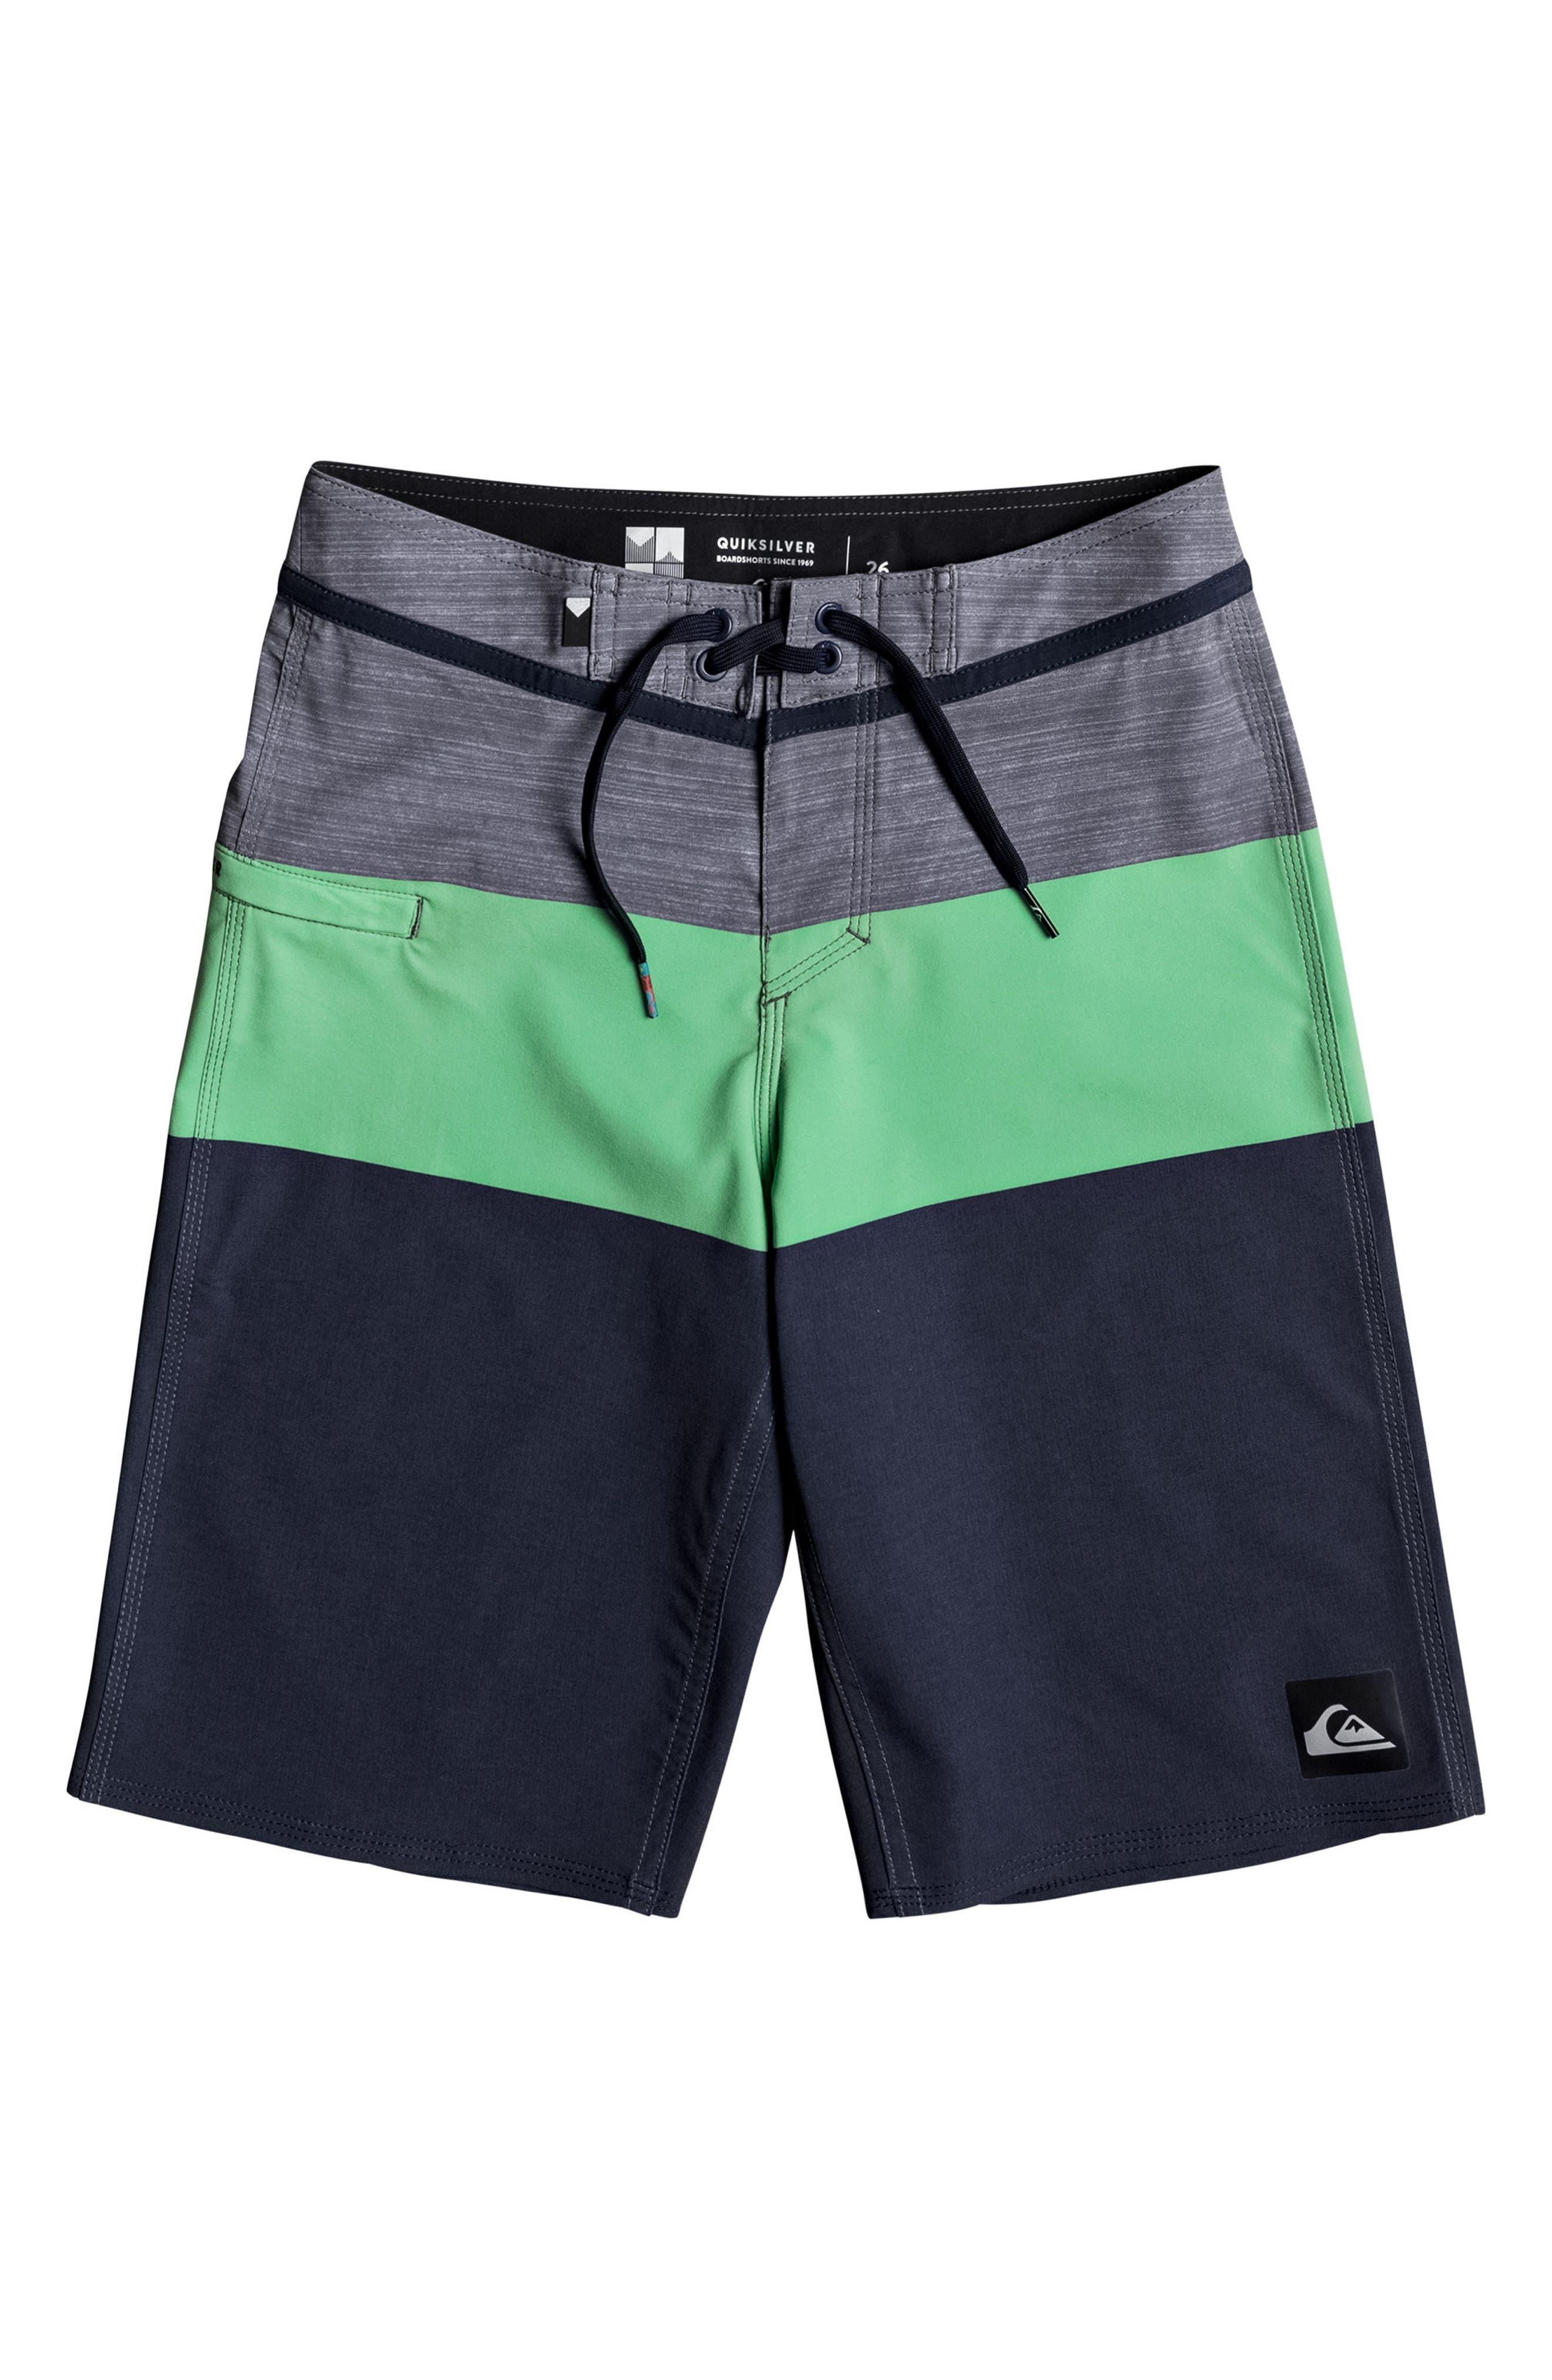 Everyday Blocked Vee Board Shorts,                         Main,                         color, 328